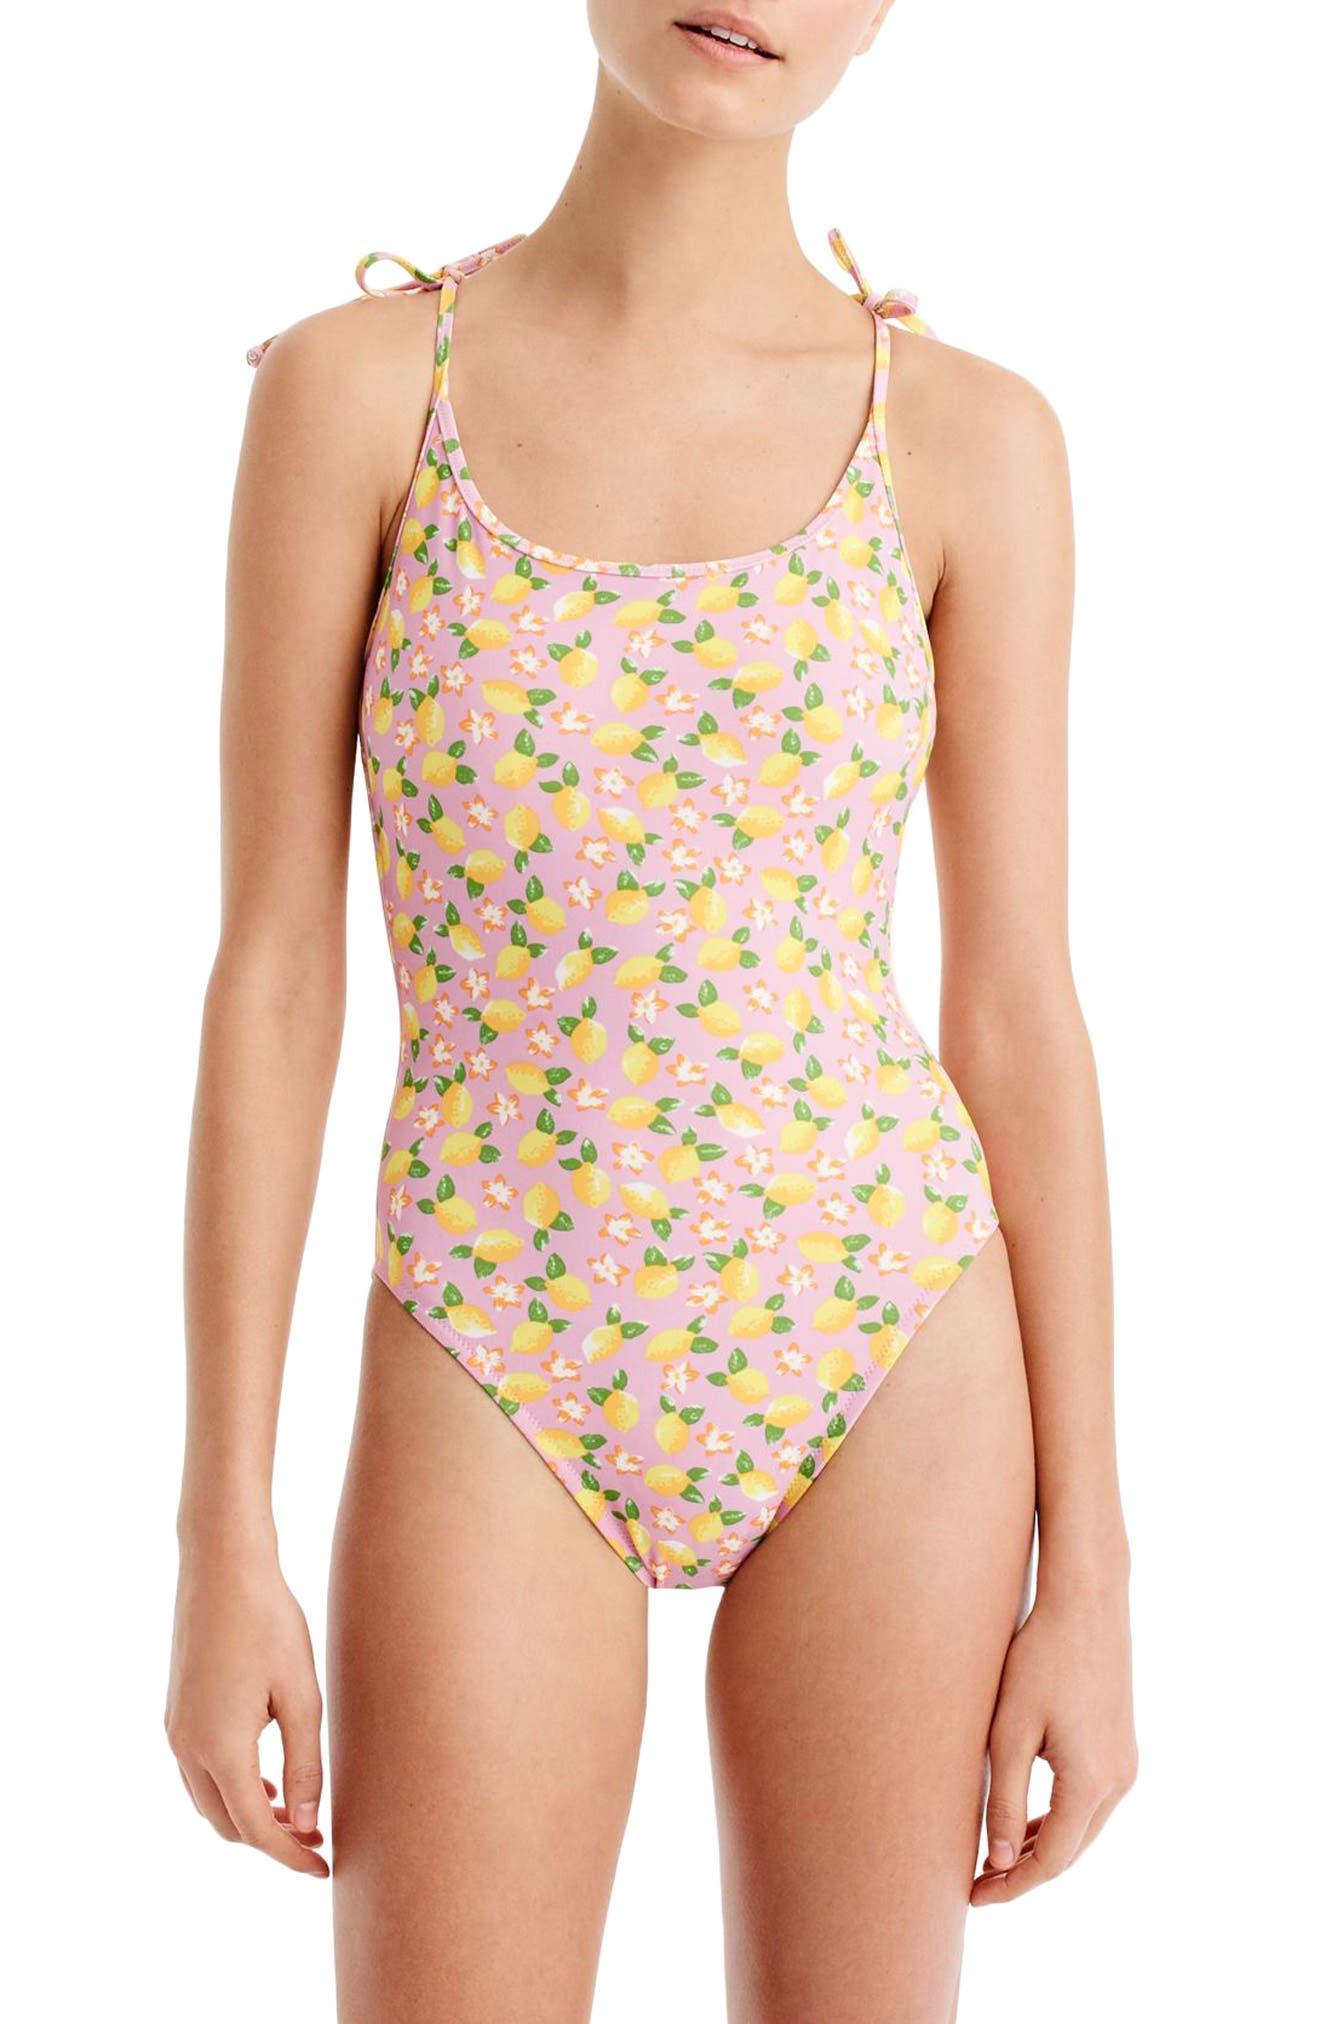 J.Crew Lemon Print One-Piece Swimsuit